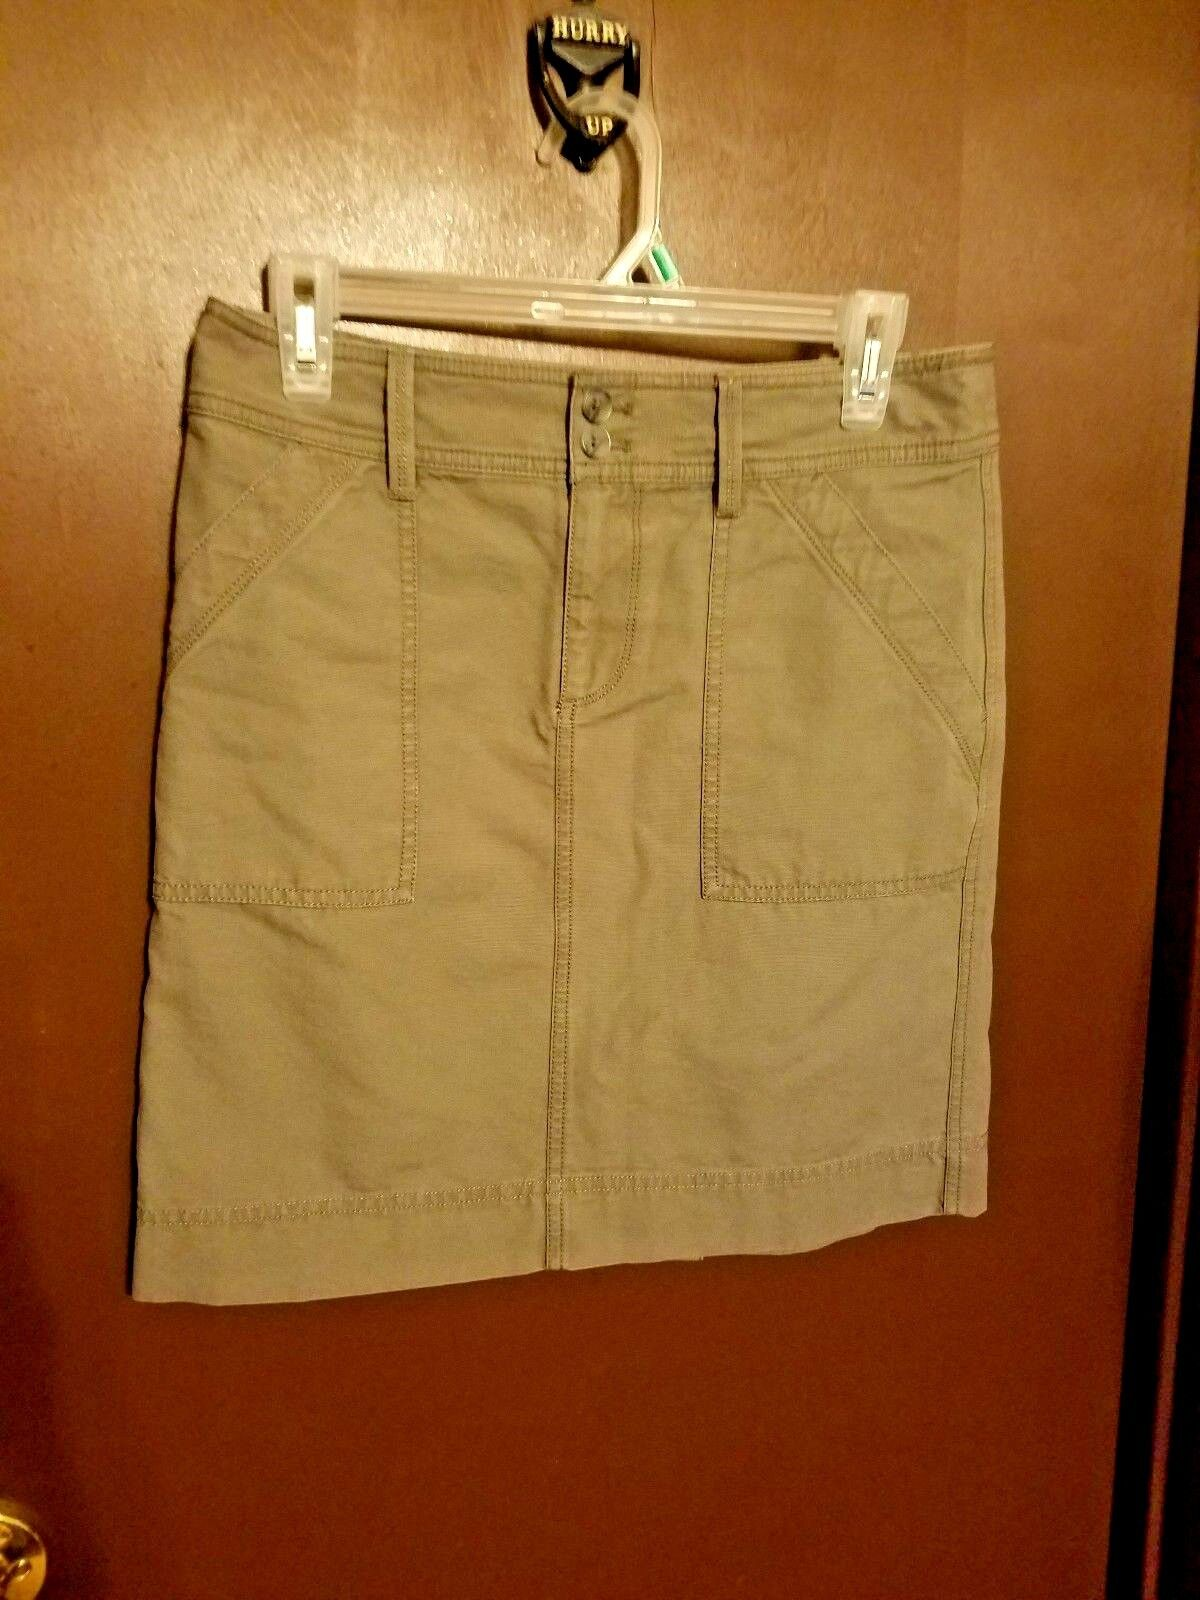 Ann Taylor LOFT Career Straight Pencil Skirt Khaki Beige Women Size 2 MSRP 49.50